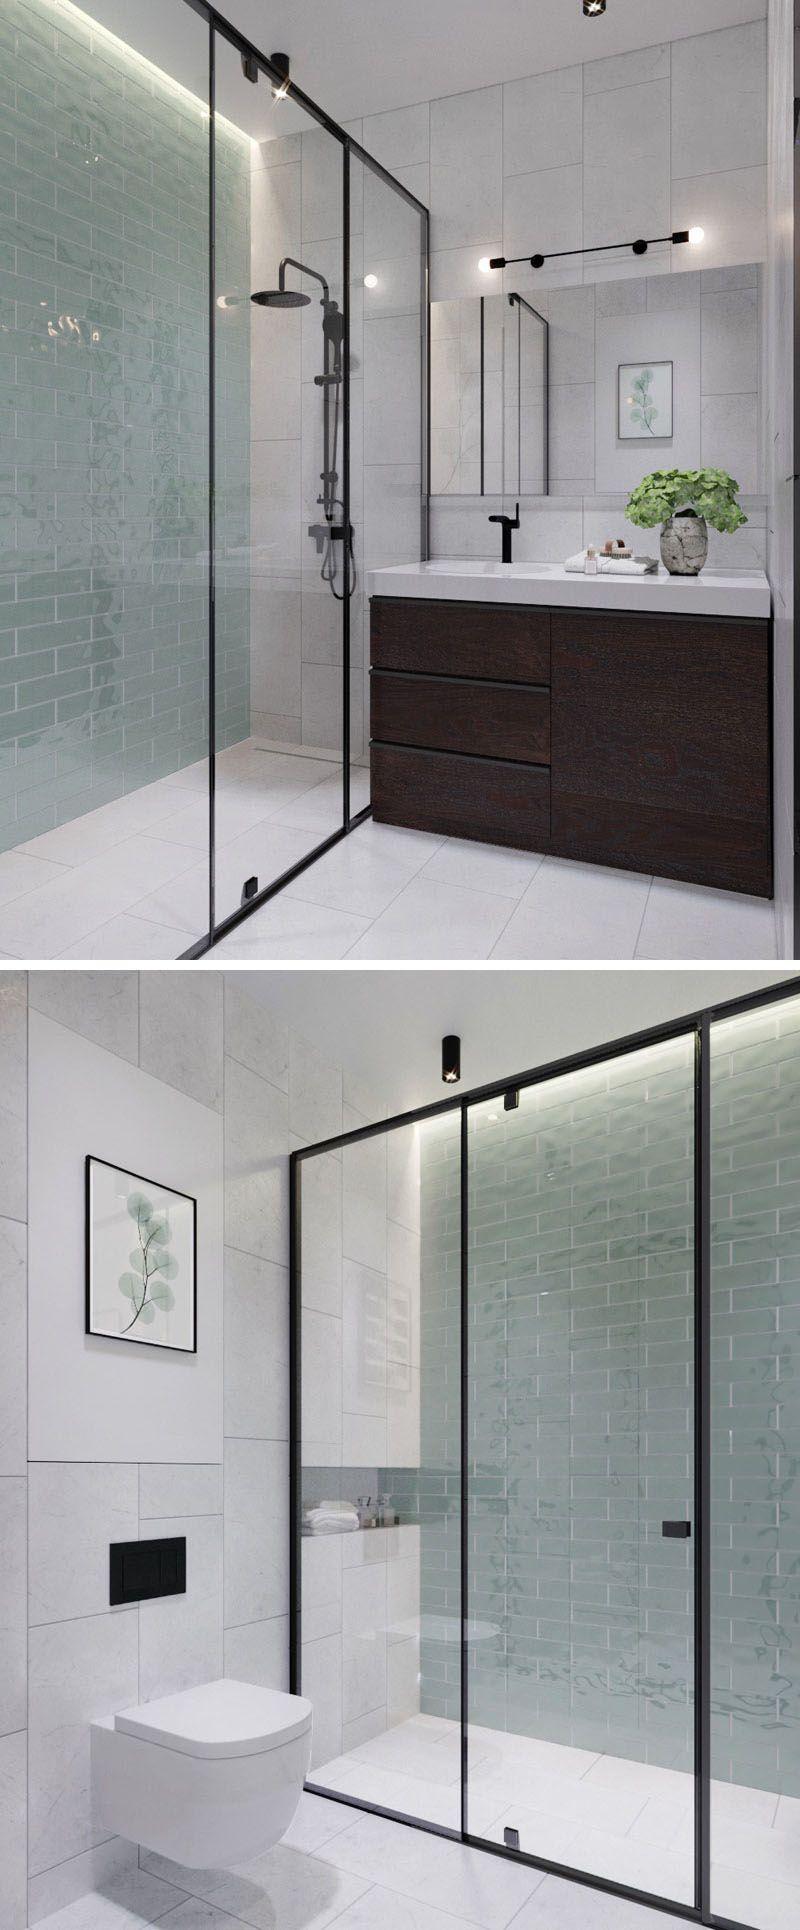 Black Framed Glass Walls Separate Bedroom In Kiev